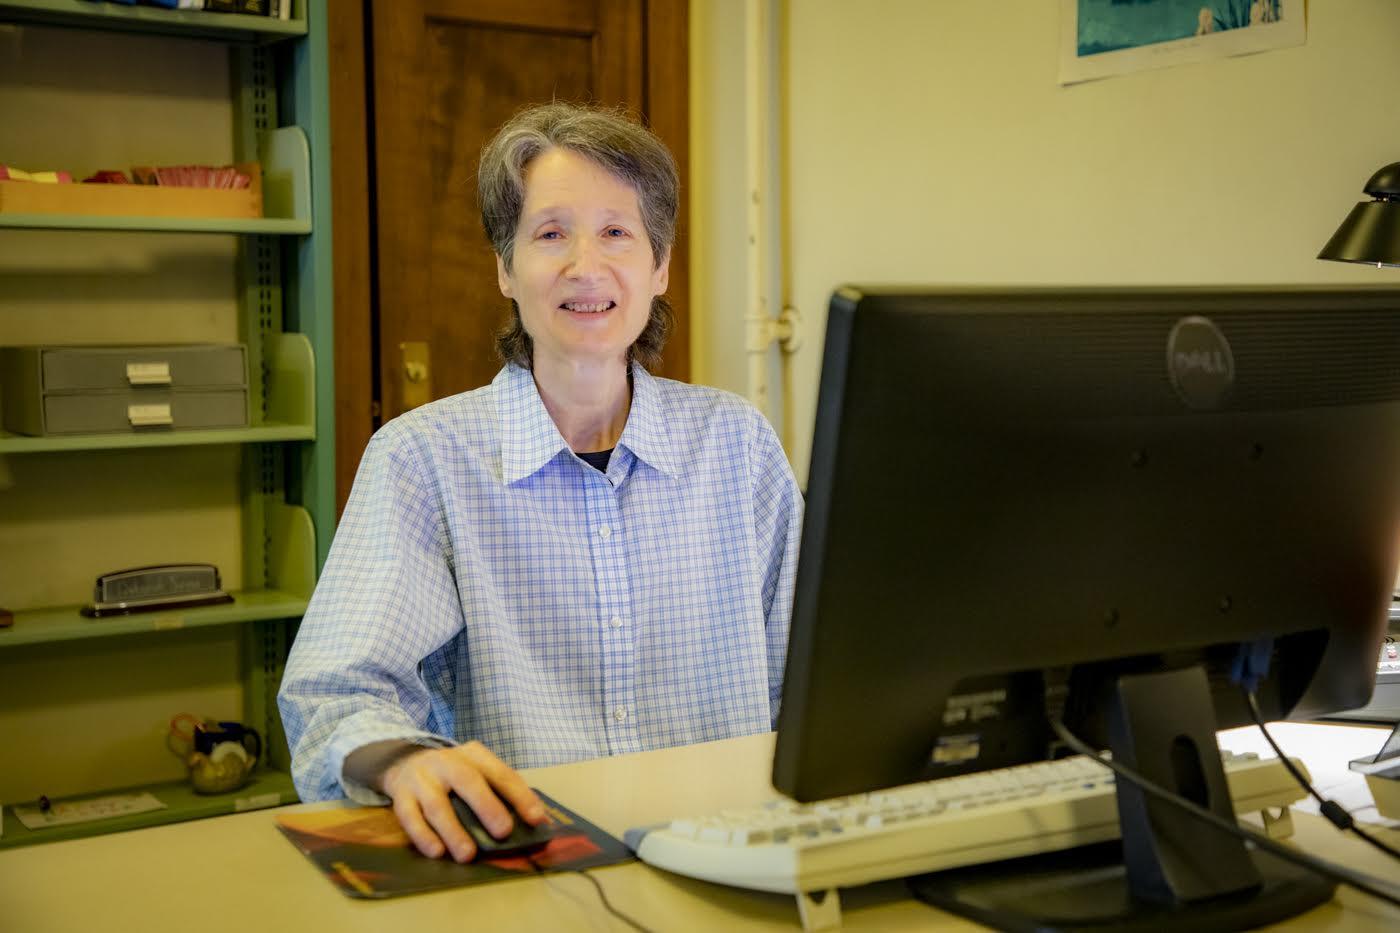 Deborah Szasz: Retiring After 42 Years at WAU